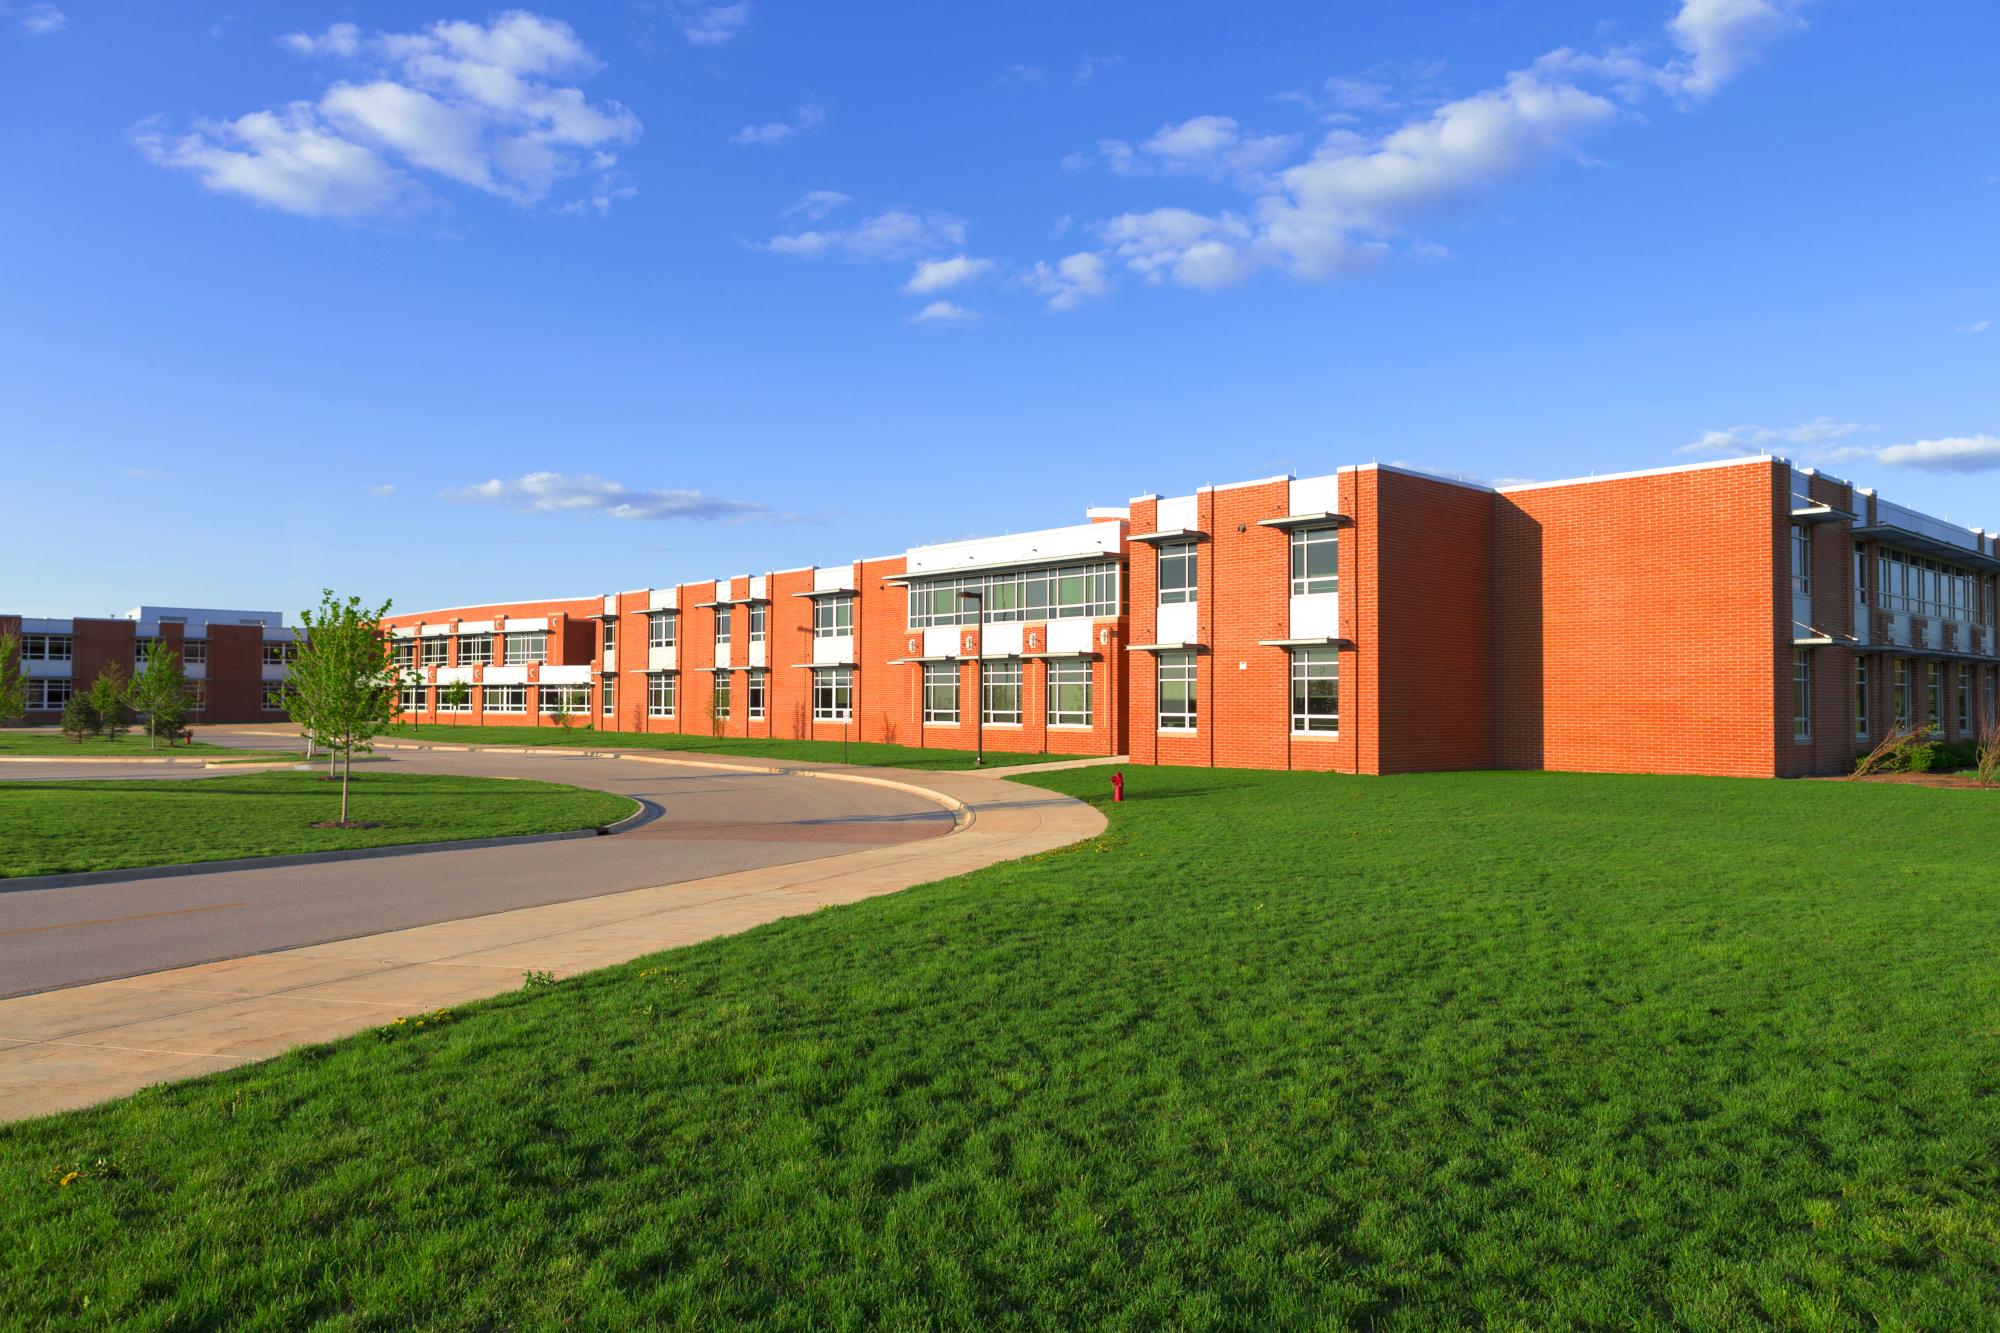 Modern,School,Building,With,Lawn